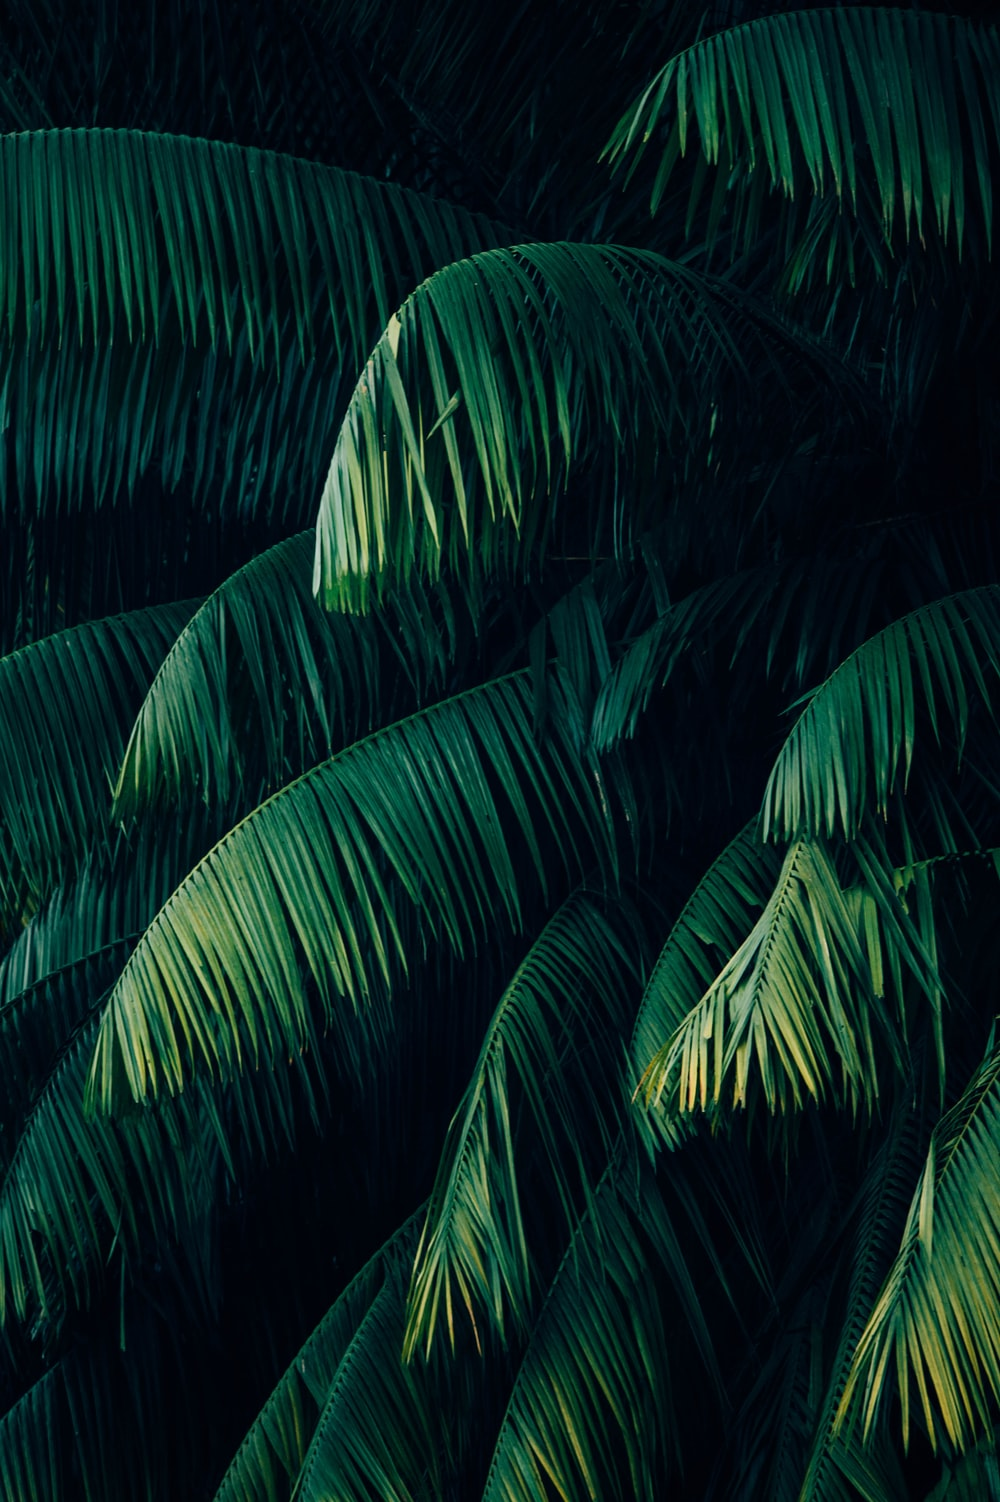 Green Fern Photo Free Plant Image On Unsplash